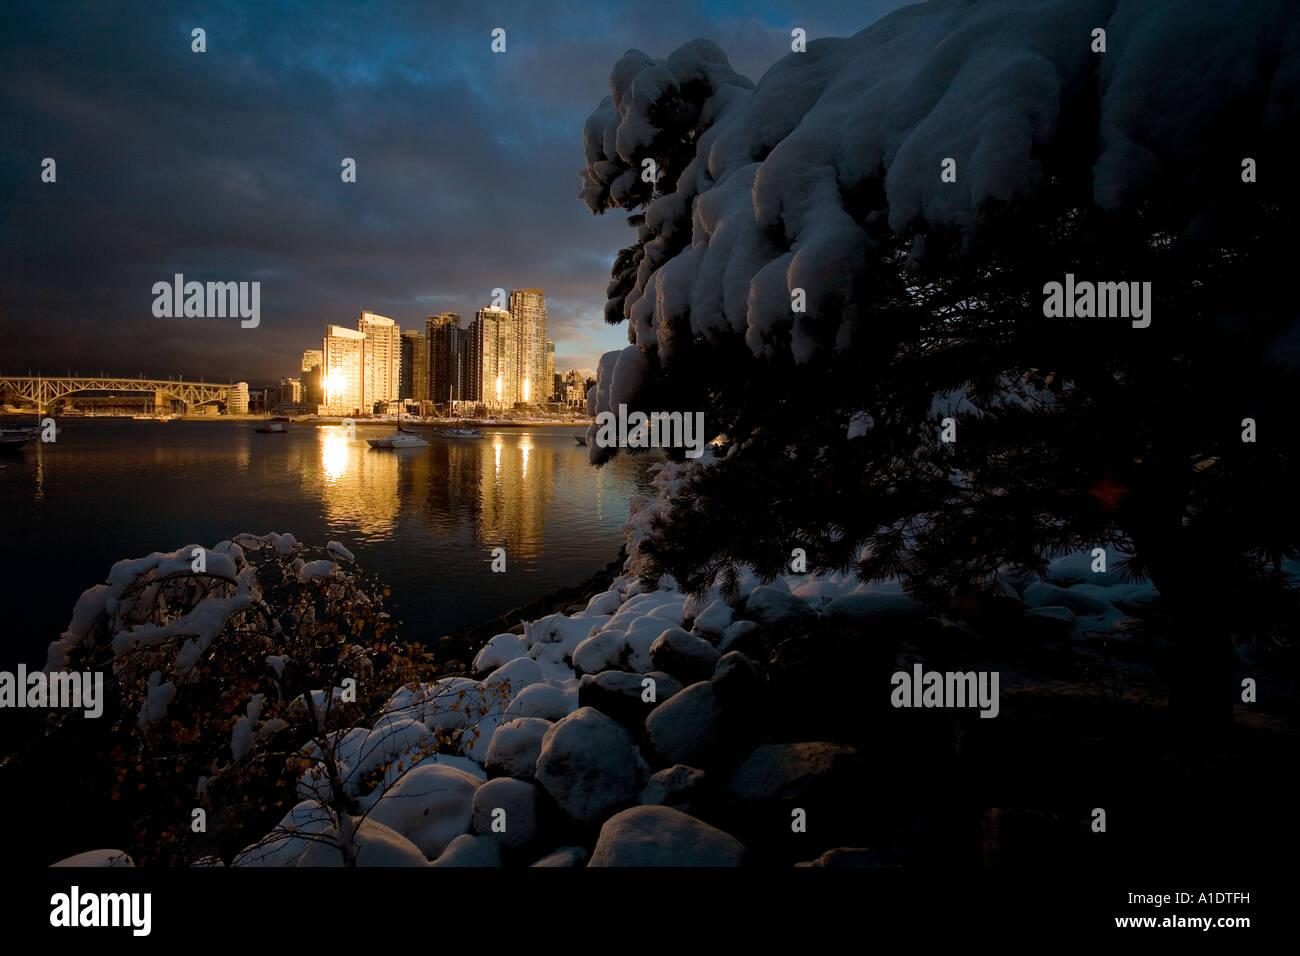 Sonnenaufgang über dem False Creek, Vancouver, Britisch-Kolumbien, Kanada nach Tagen des Datensatzes Duschen Stockbild